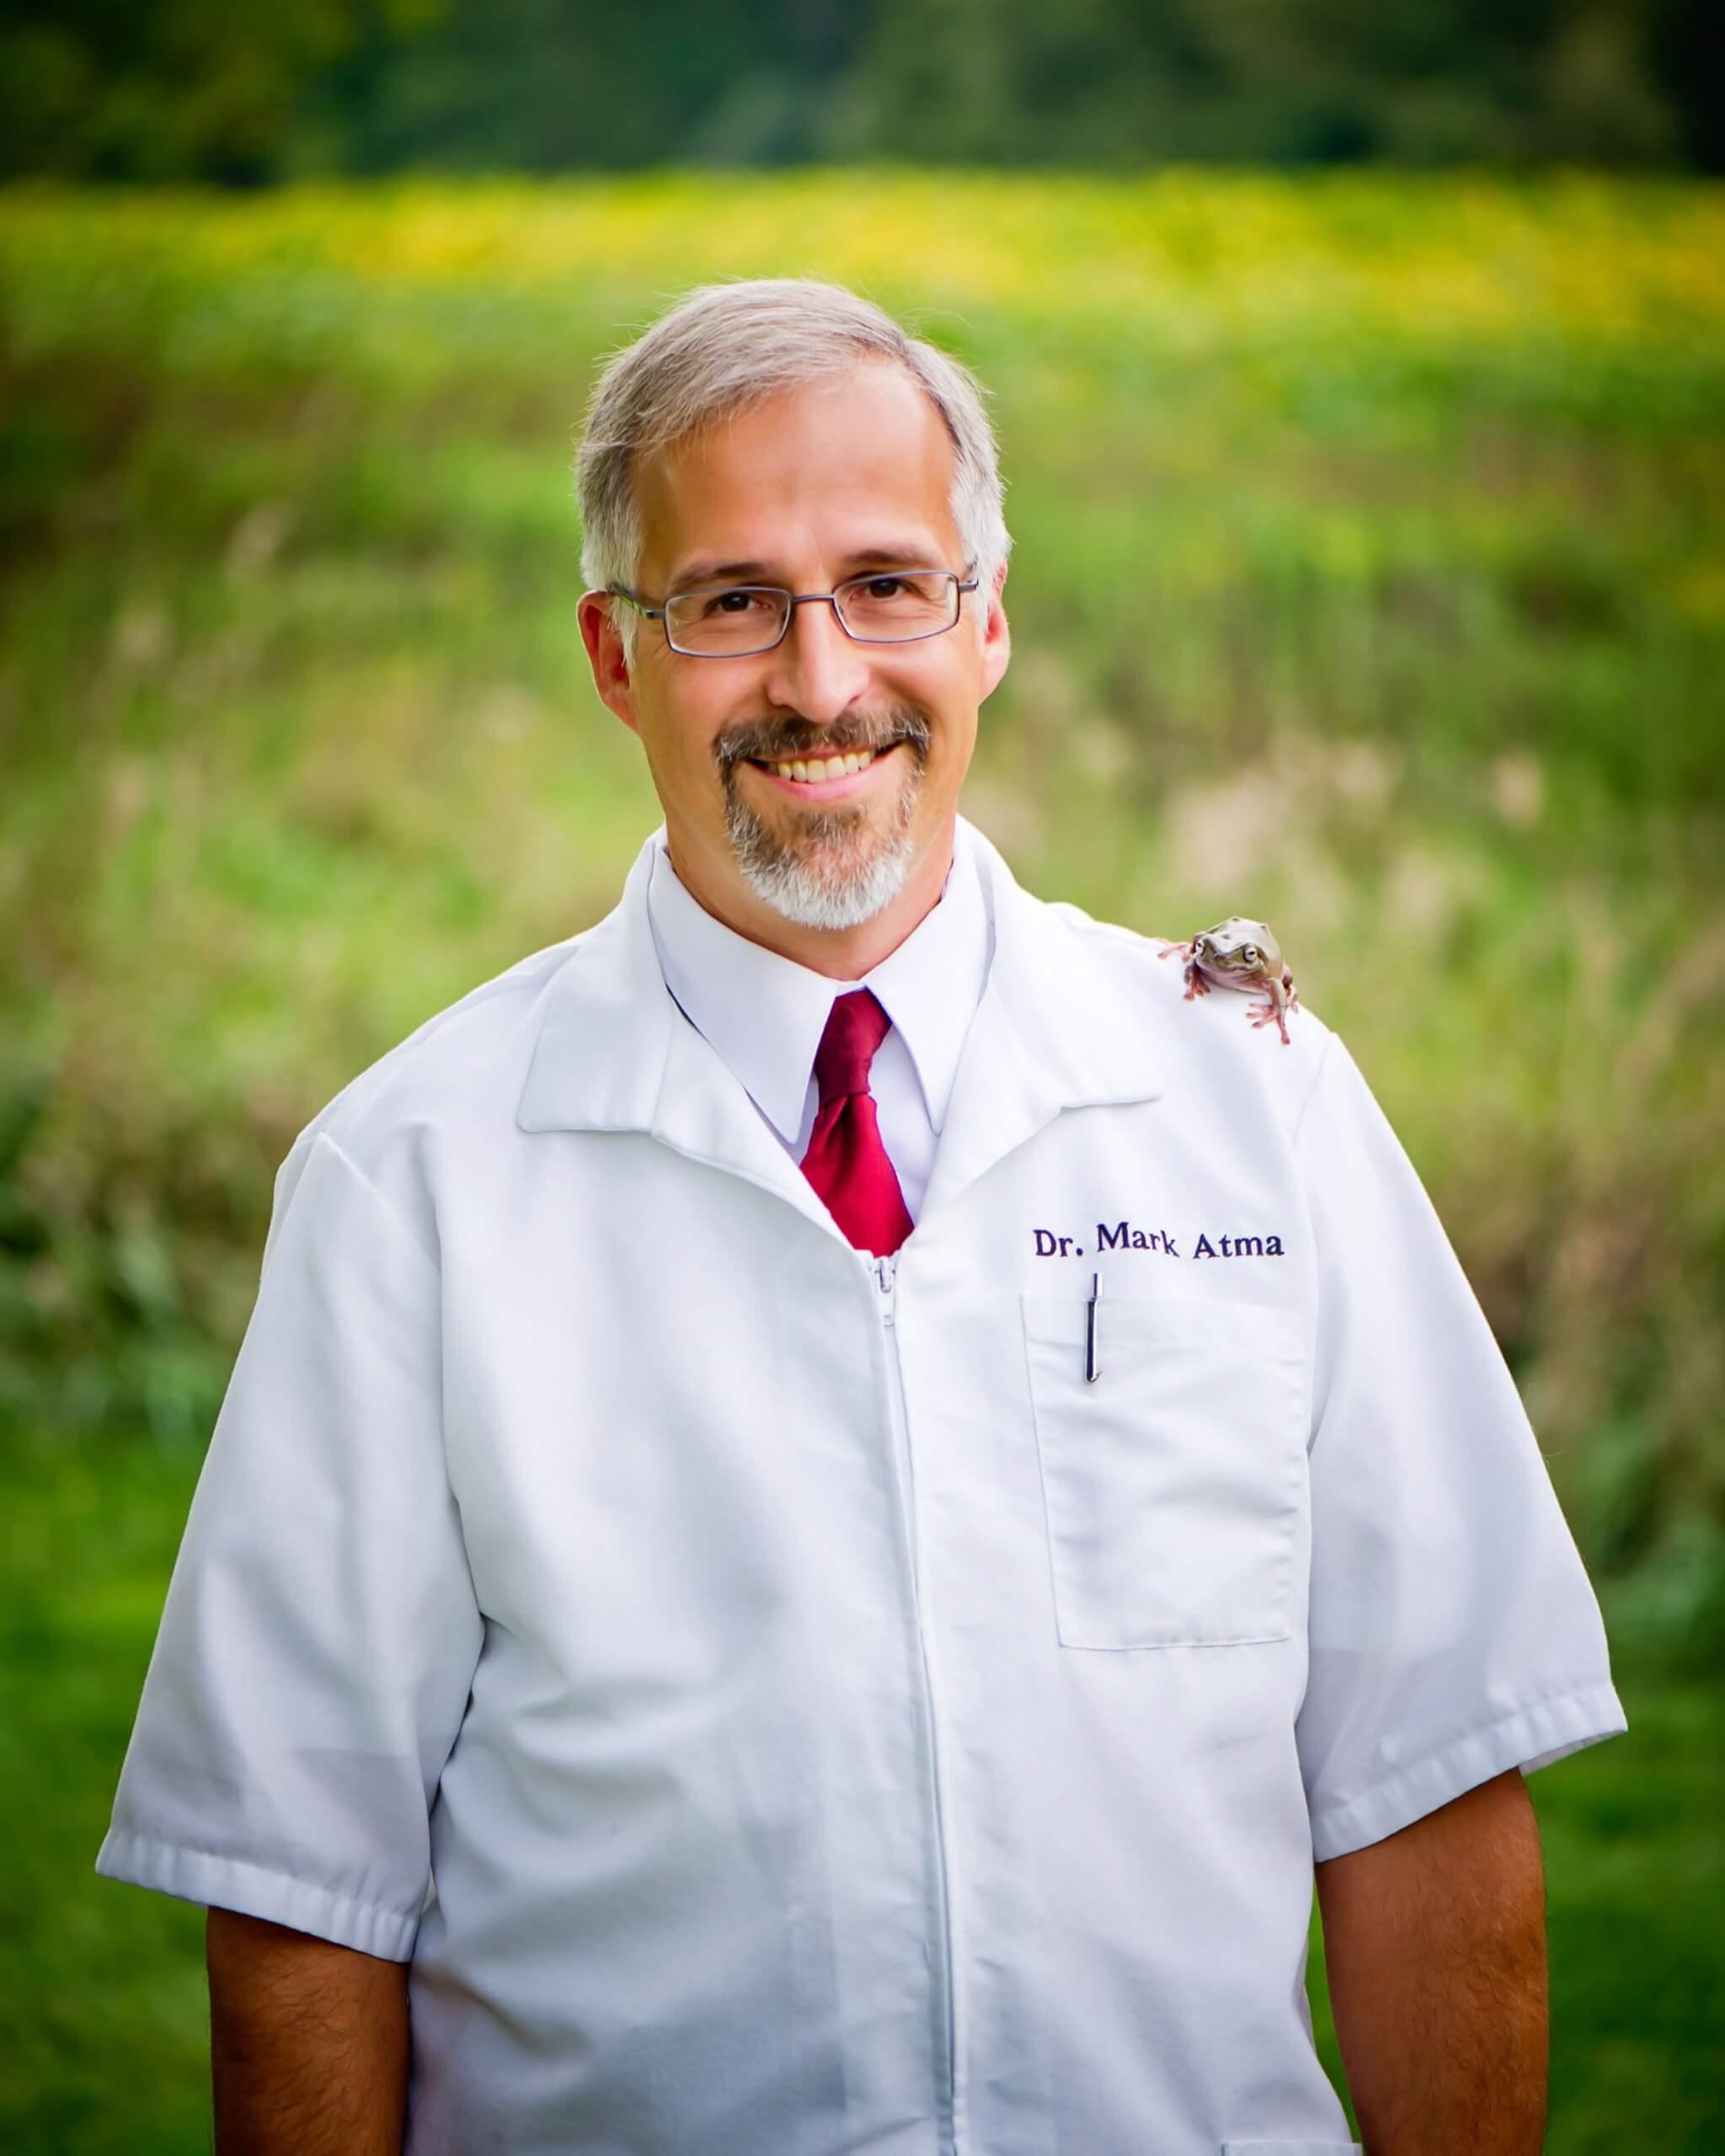 Dr. Mark Atma